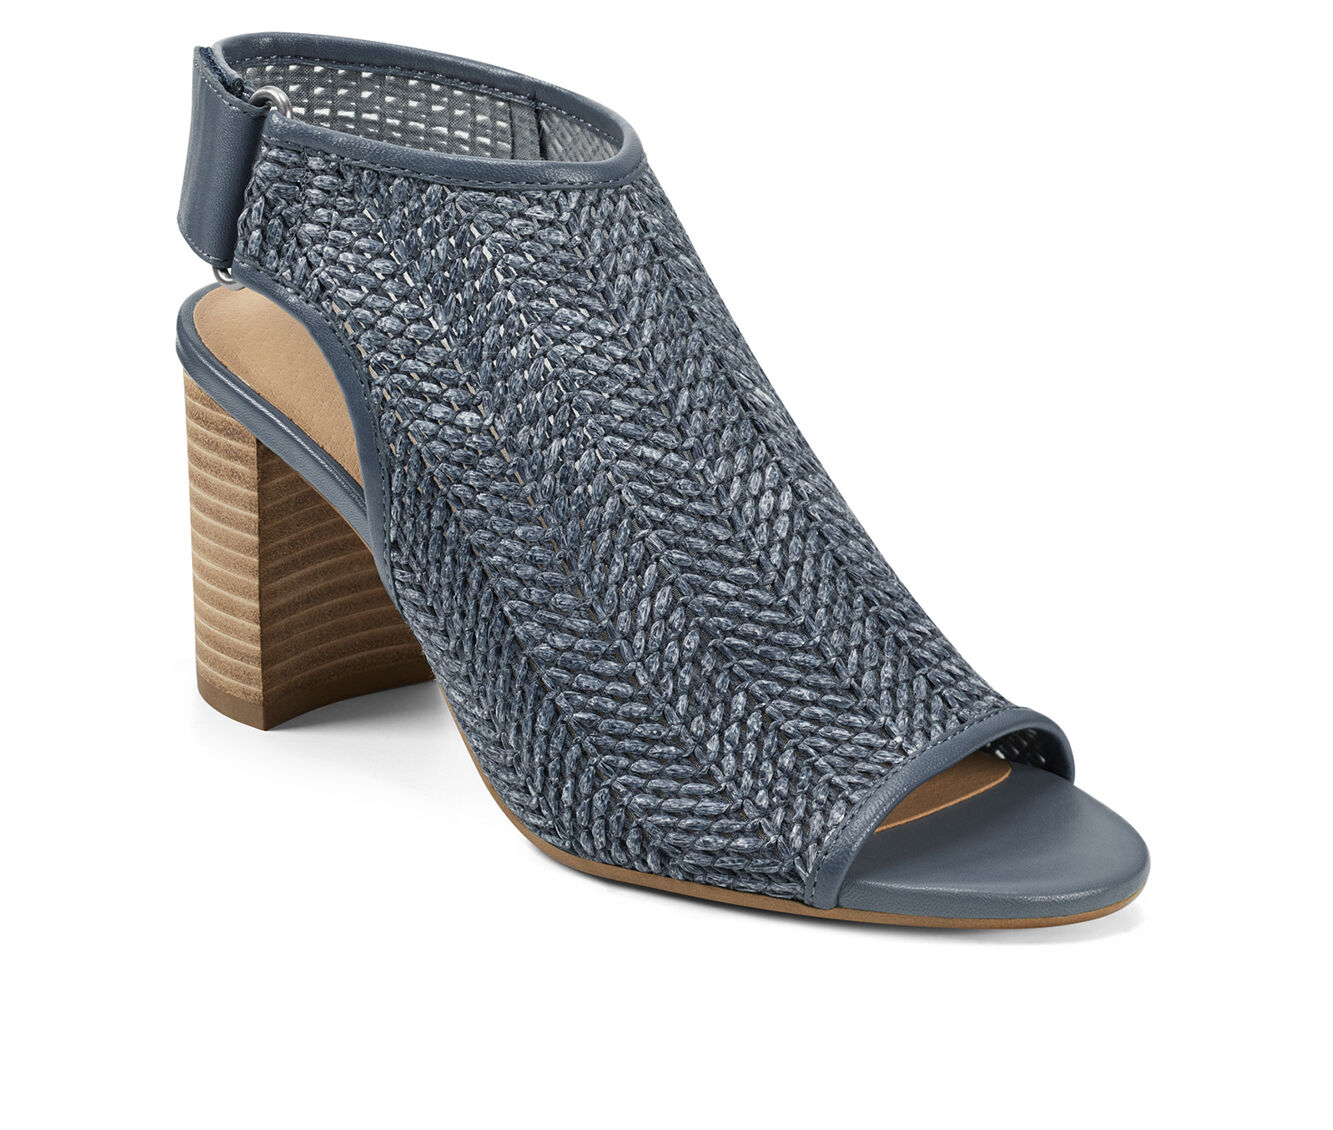 Women's Aerosoles High Impact Peep Toe Booties | Women's shoes | 2020 New K7Uyz